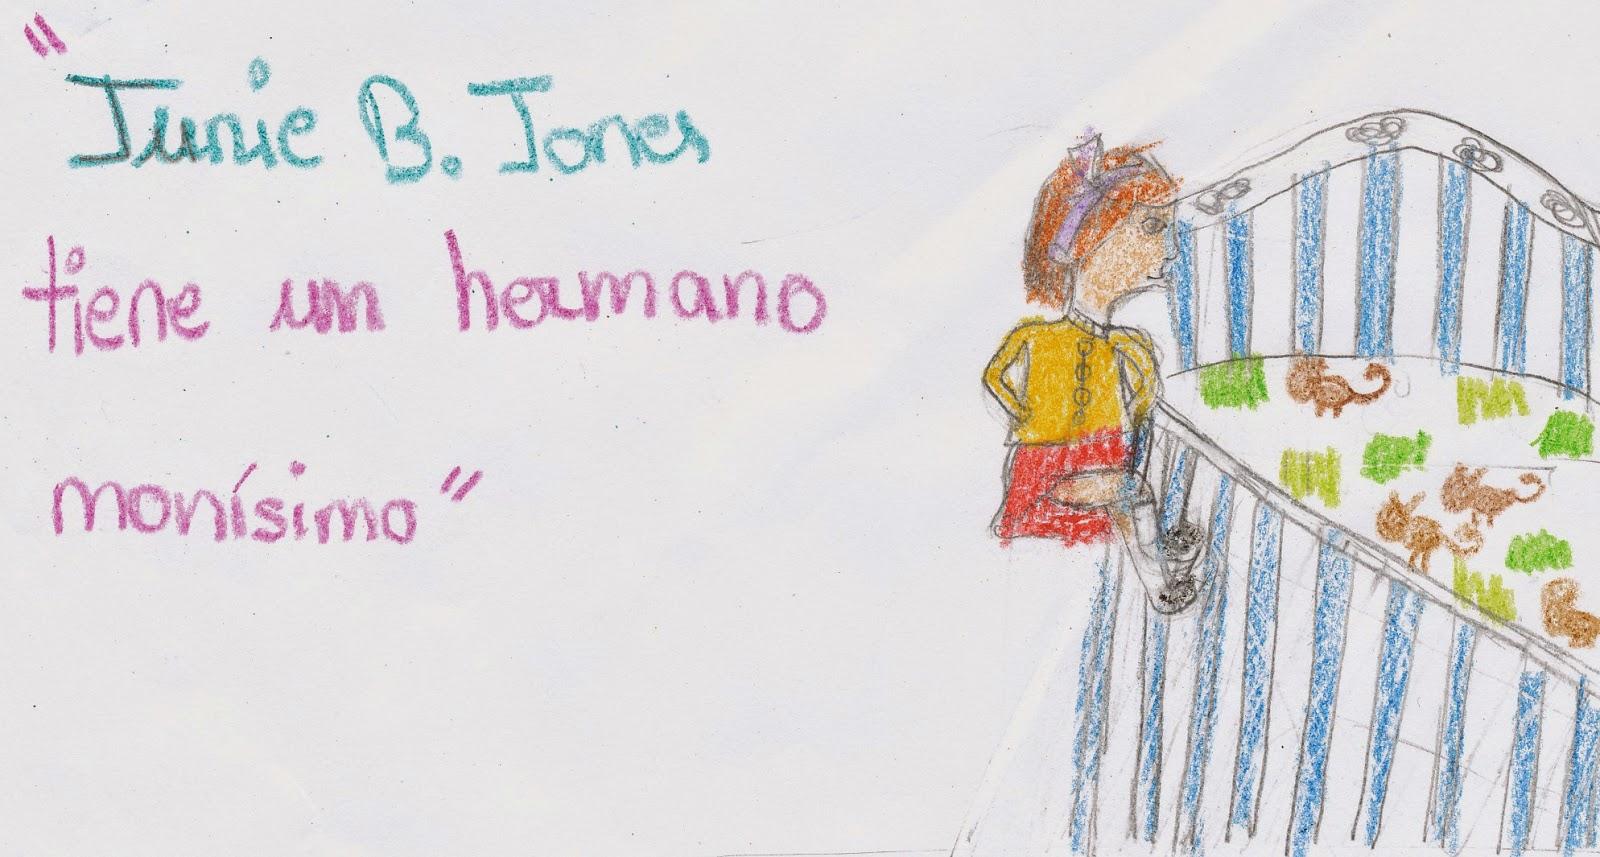 http://www.brunolibros.es/personaje.php?id=50035&personaje=Junie%20B.%20Jones